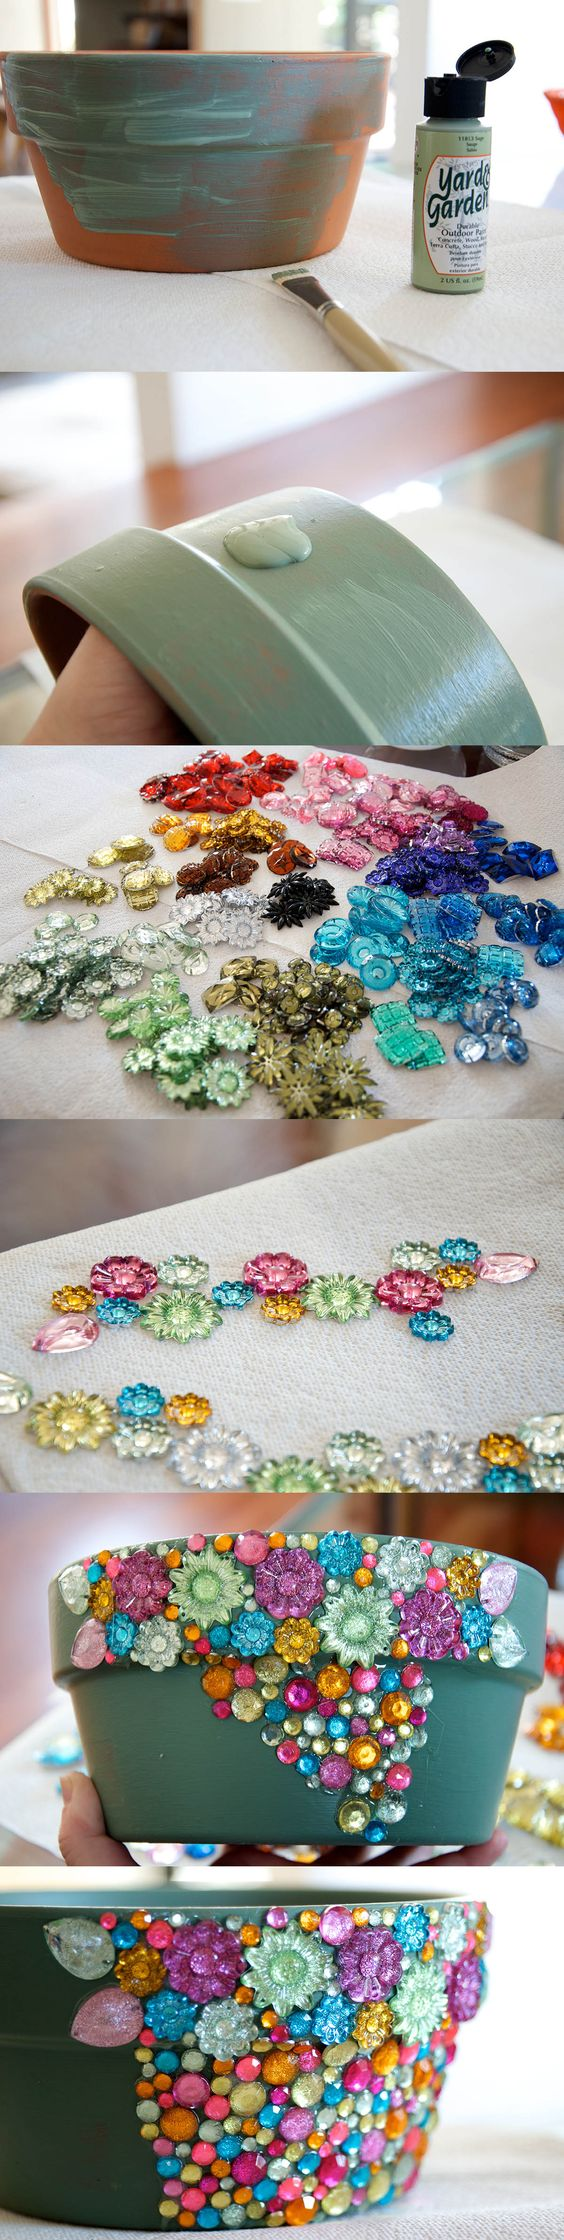 How-To Make a Jeweled Terra Cotta Pot: